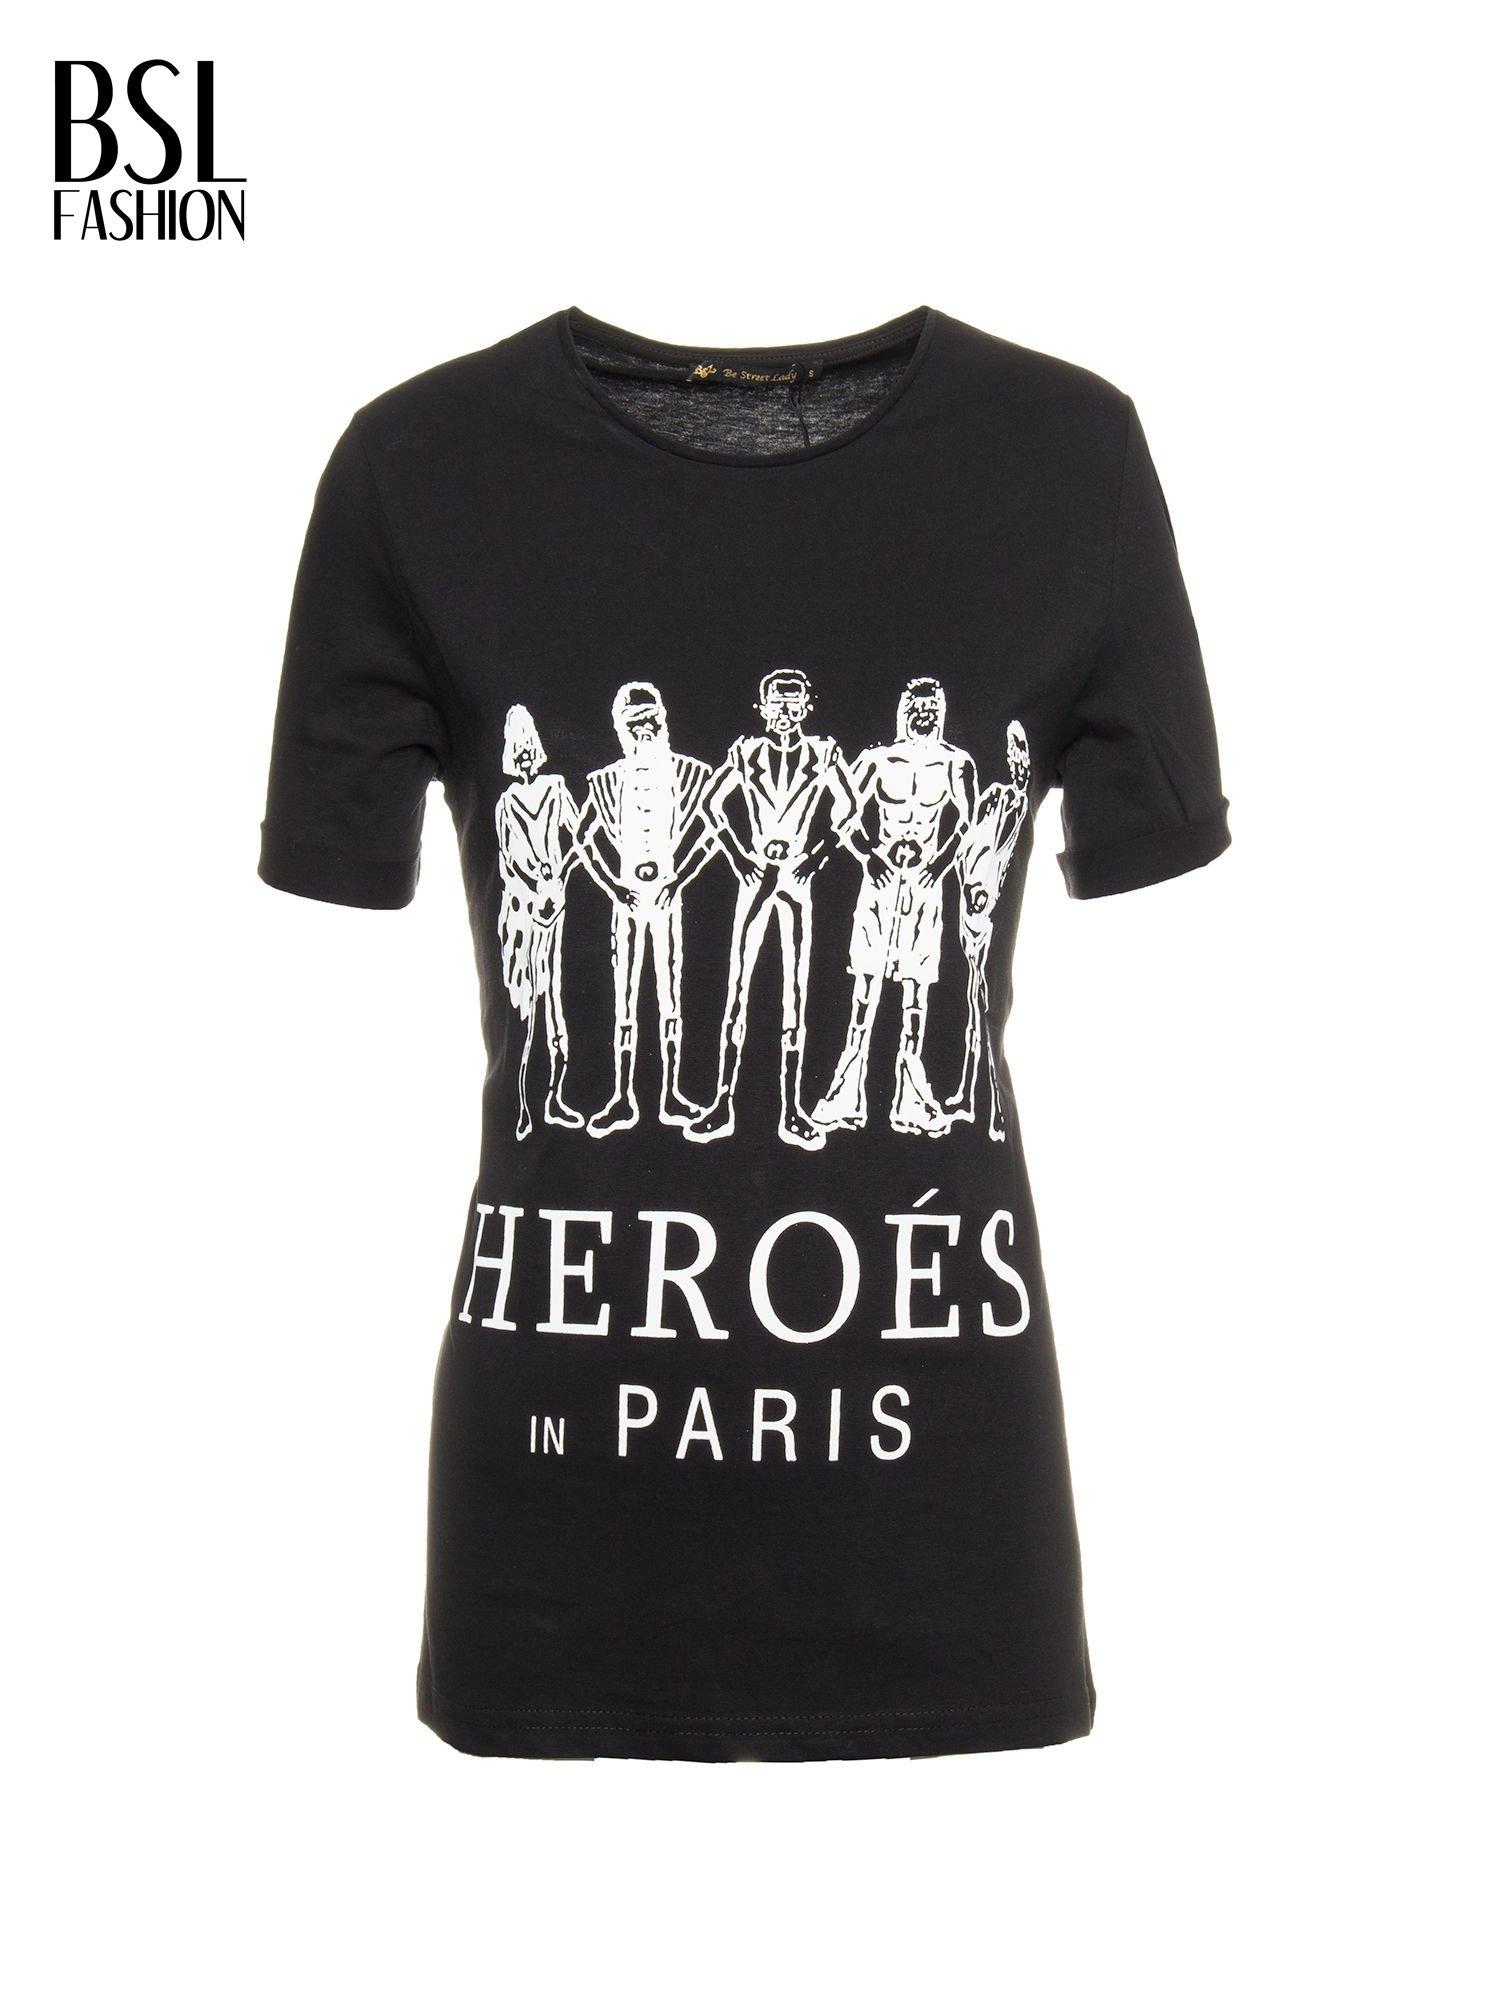 Czarny t-shirt z nadrukiem HEROÉS IN PARIS                                  zdj.                                  2